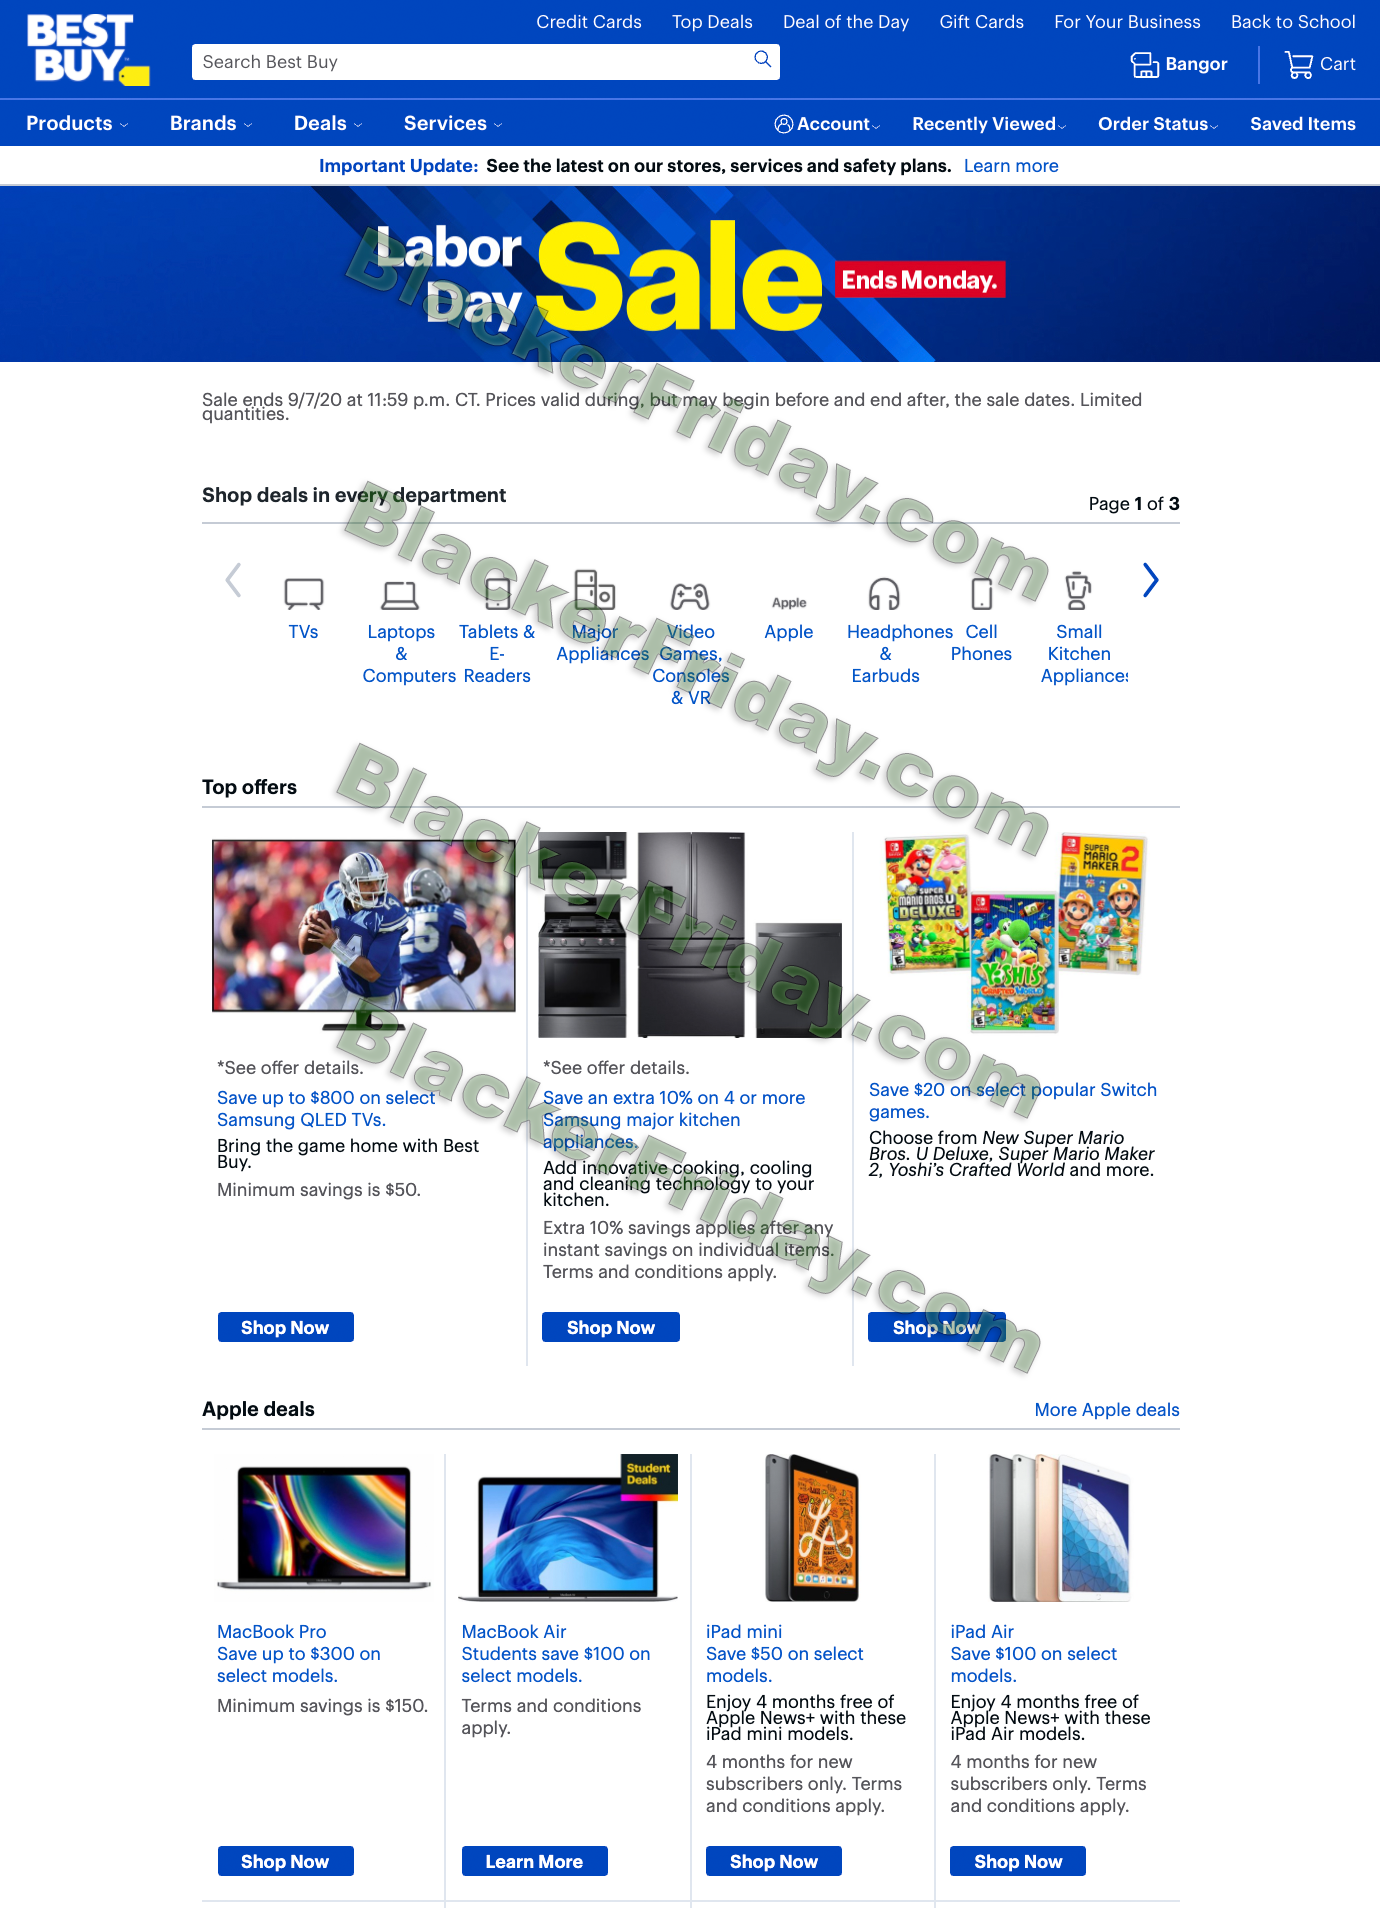 Best Buy Labor Day Sale 2020 Blacker Friday